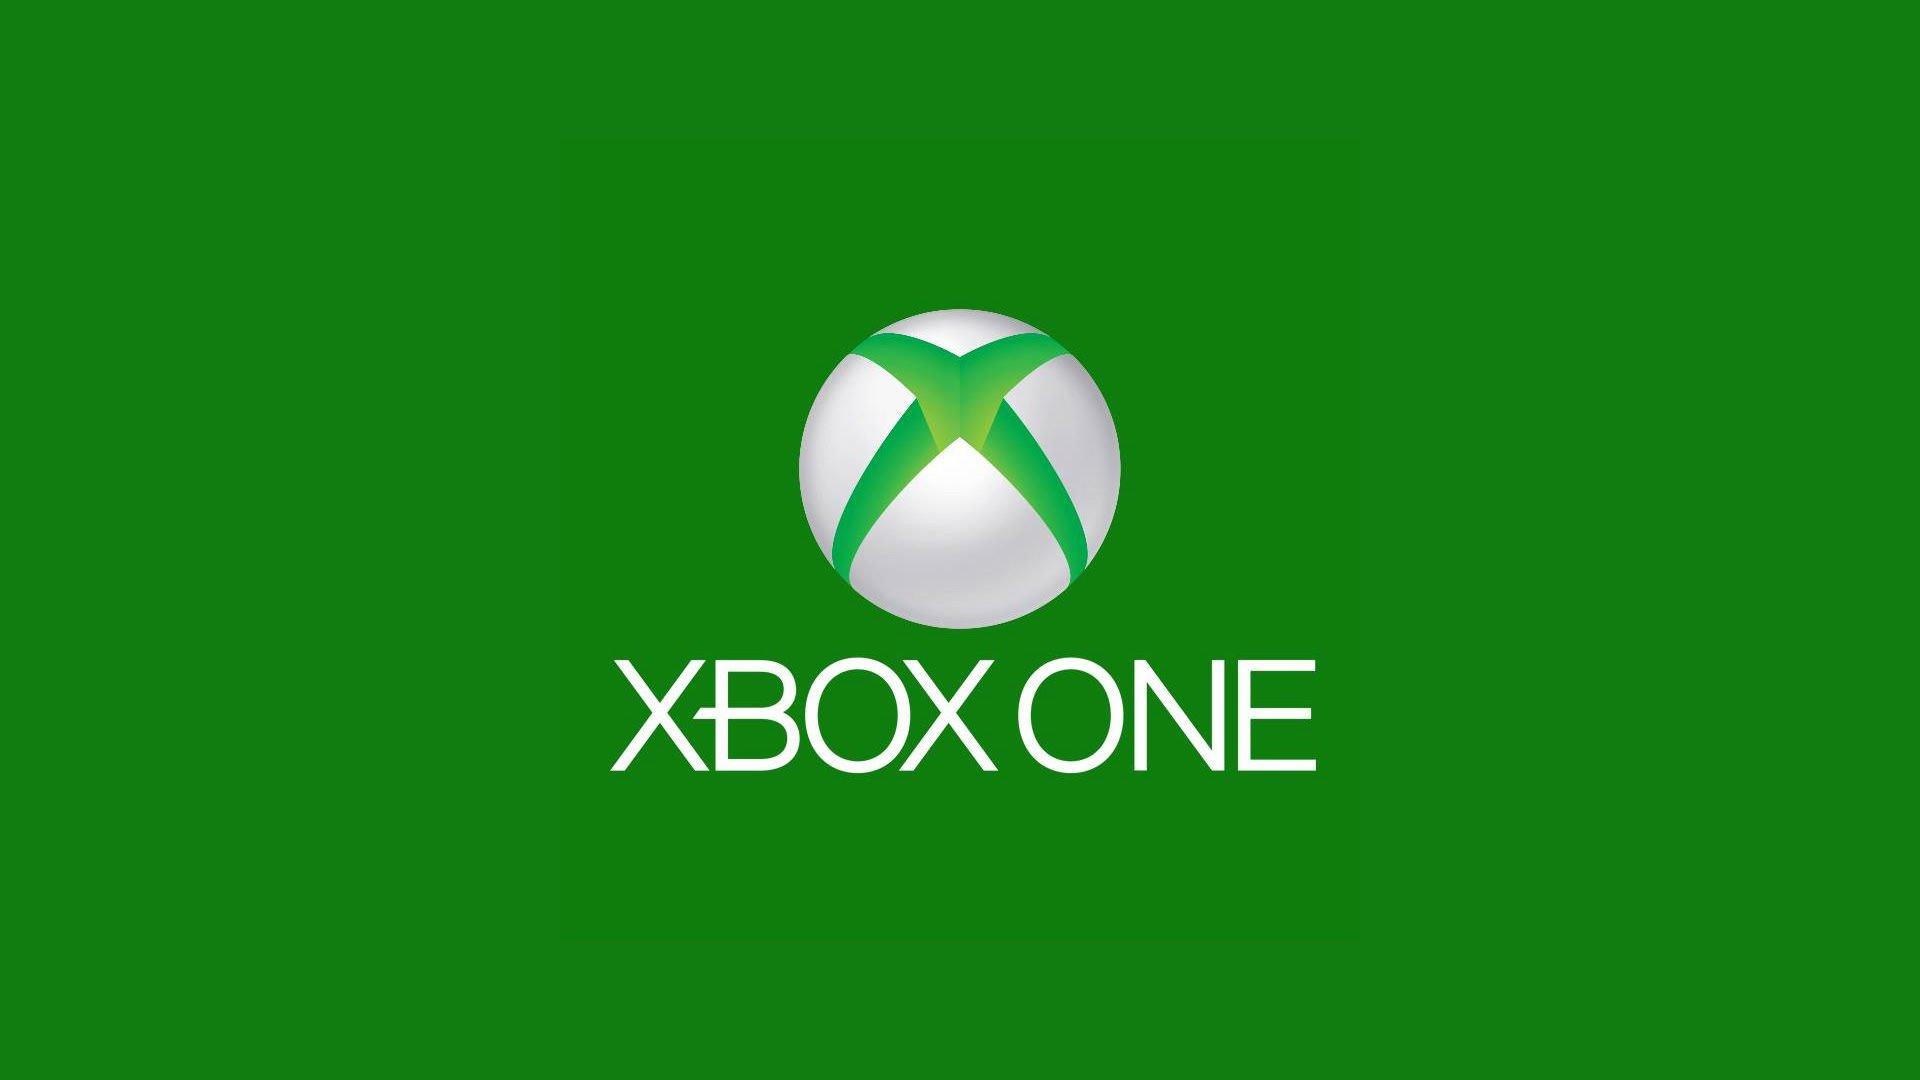 Logo de Xbox One sobre fondo verde